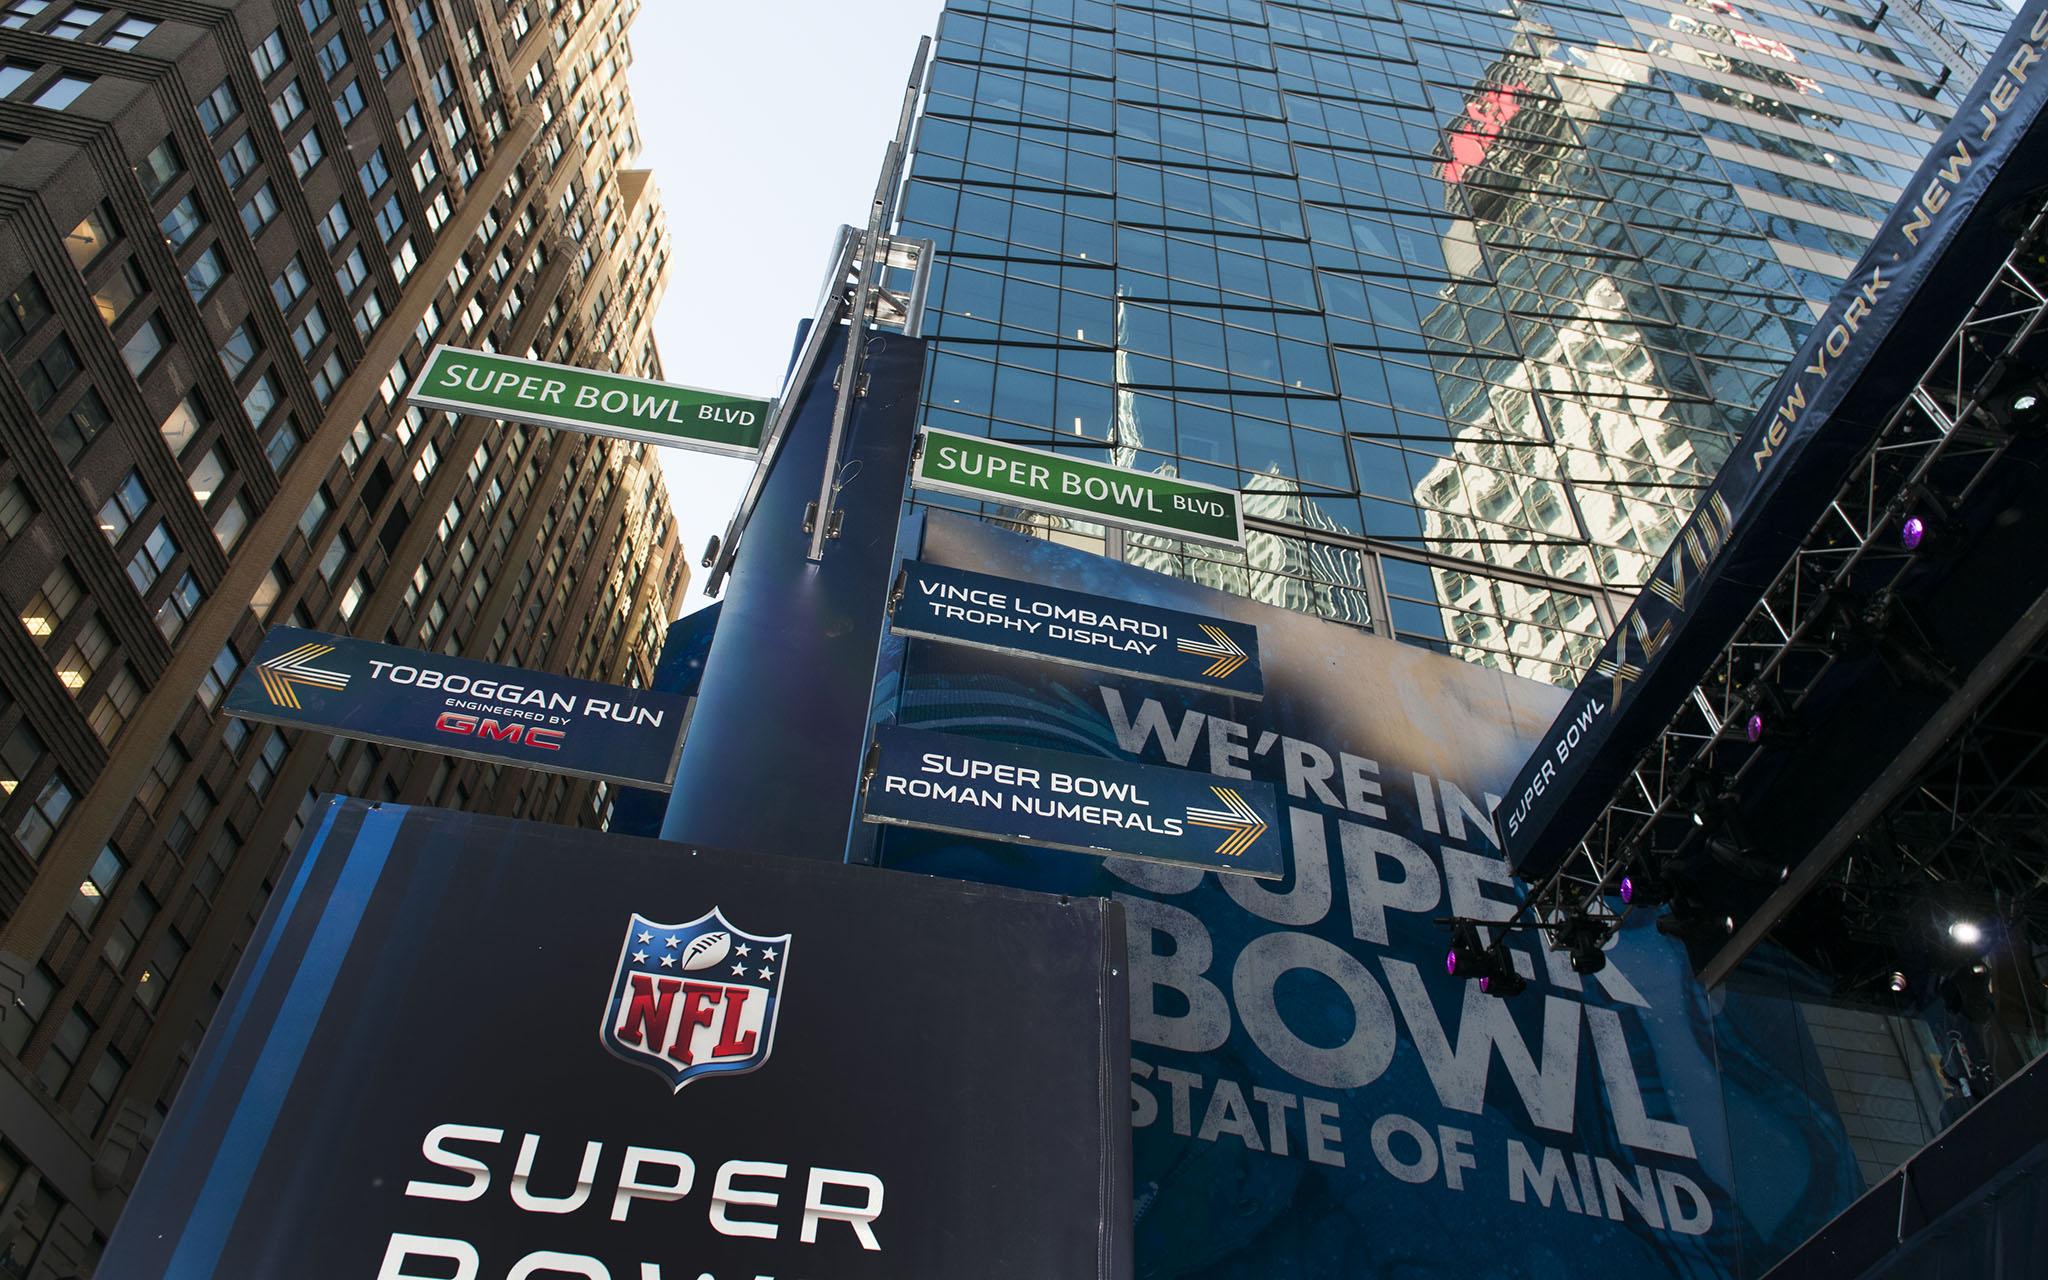 Super Bowl Boulevard